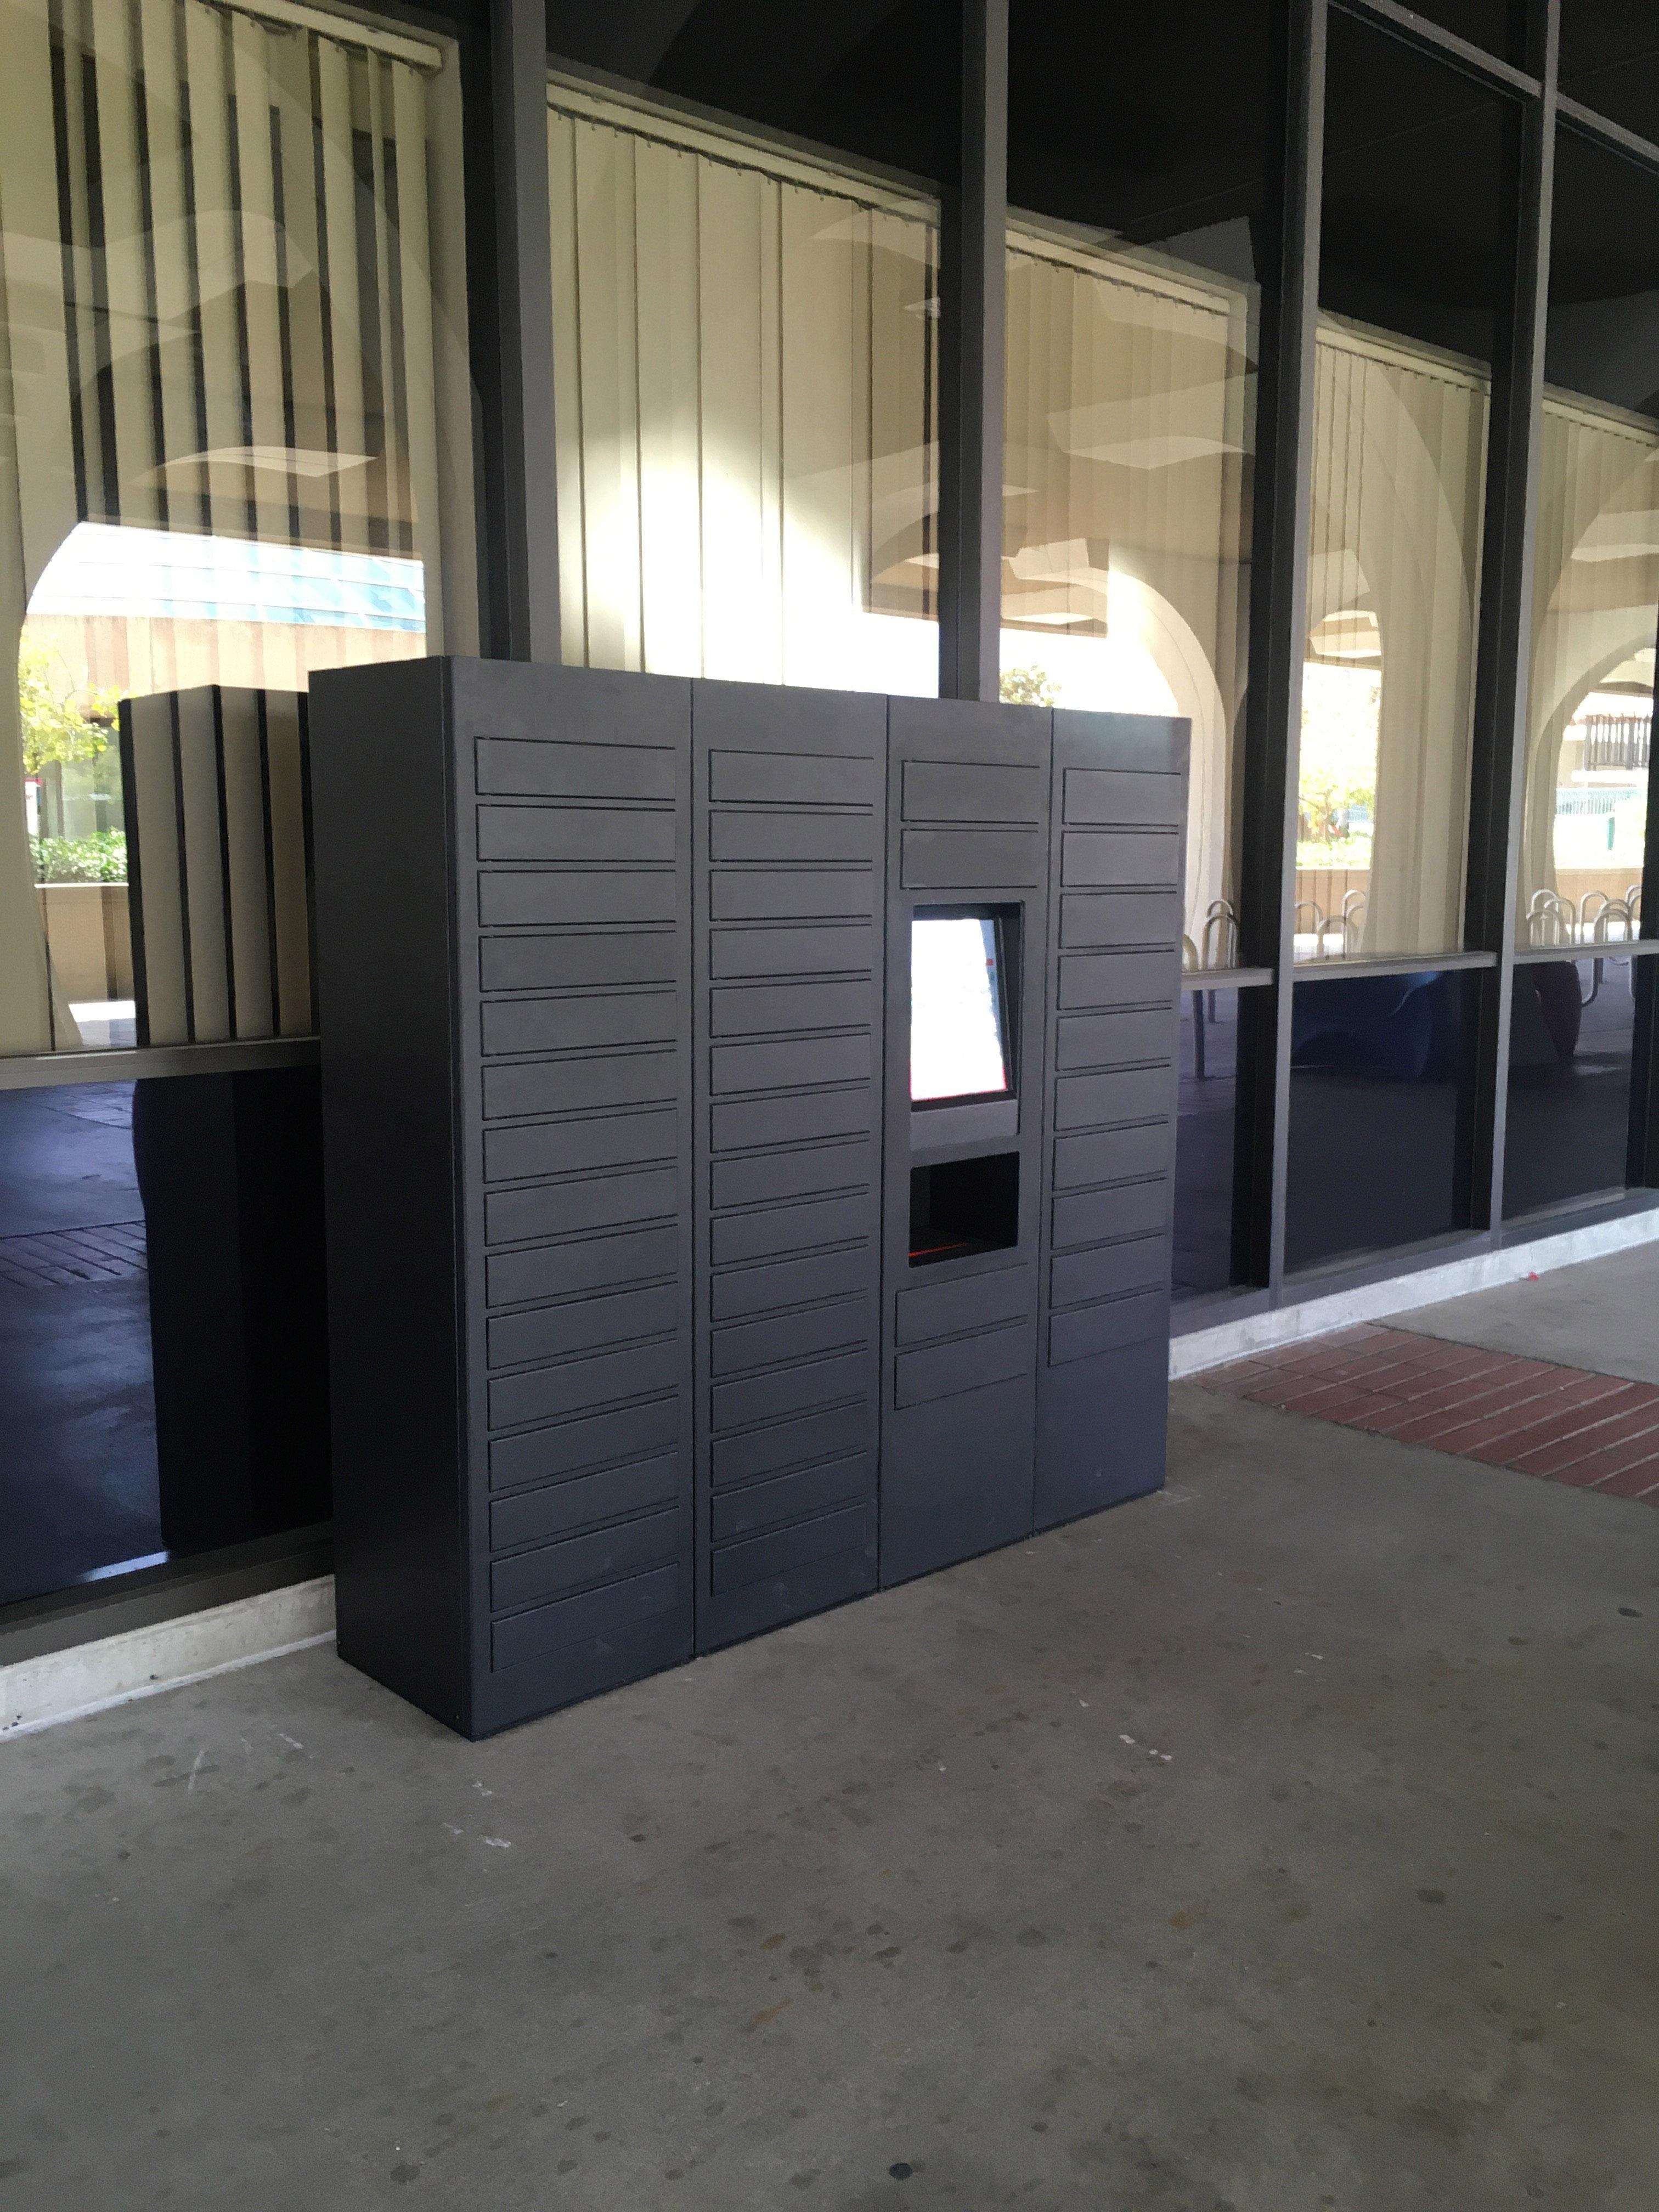 Book locker outside Love Library